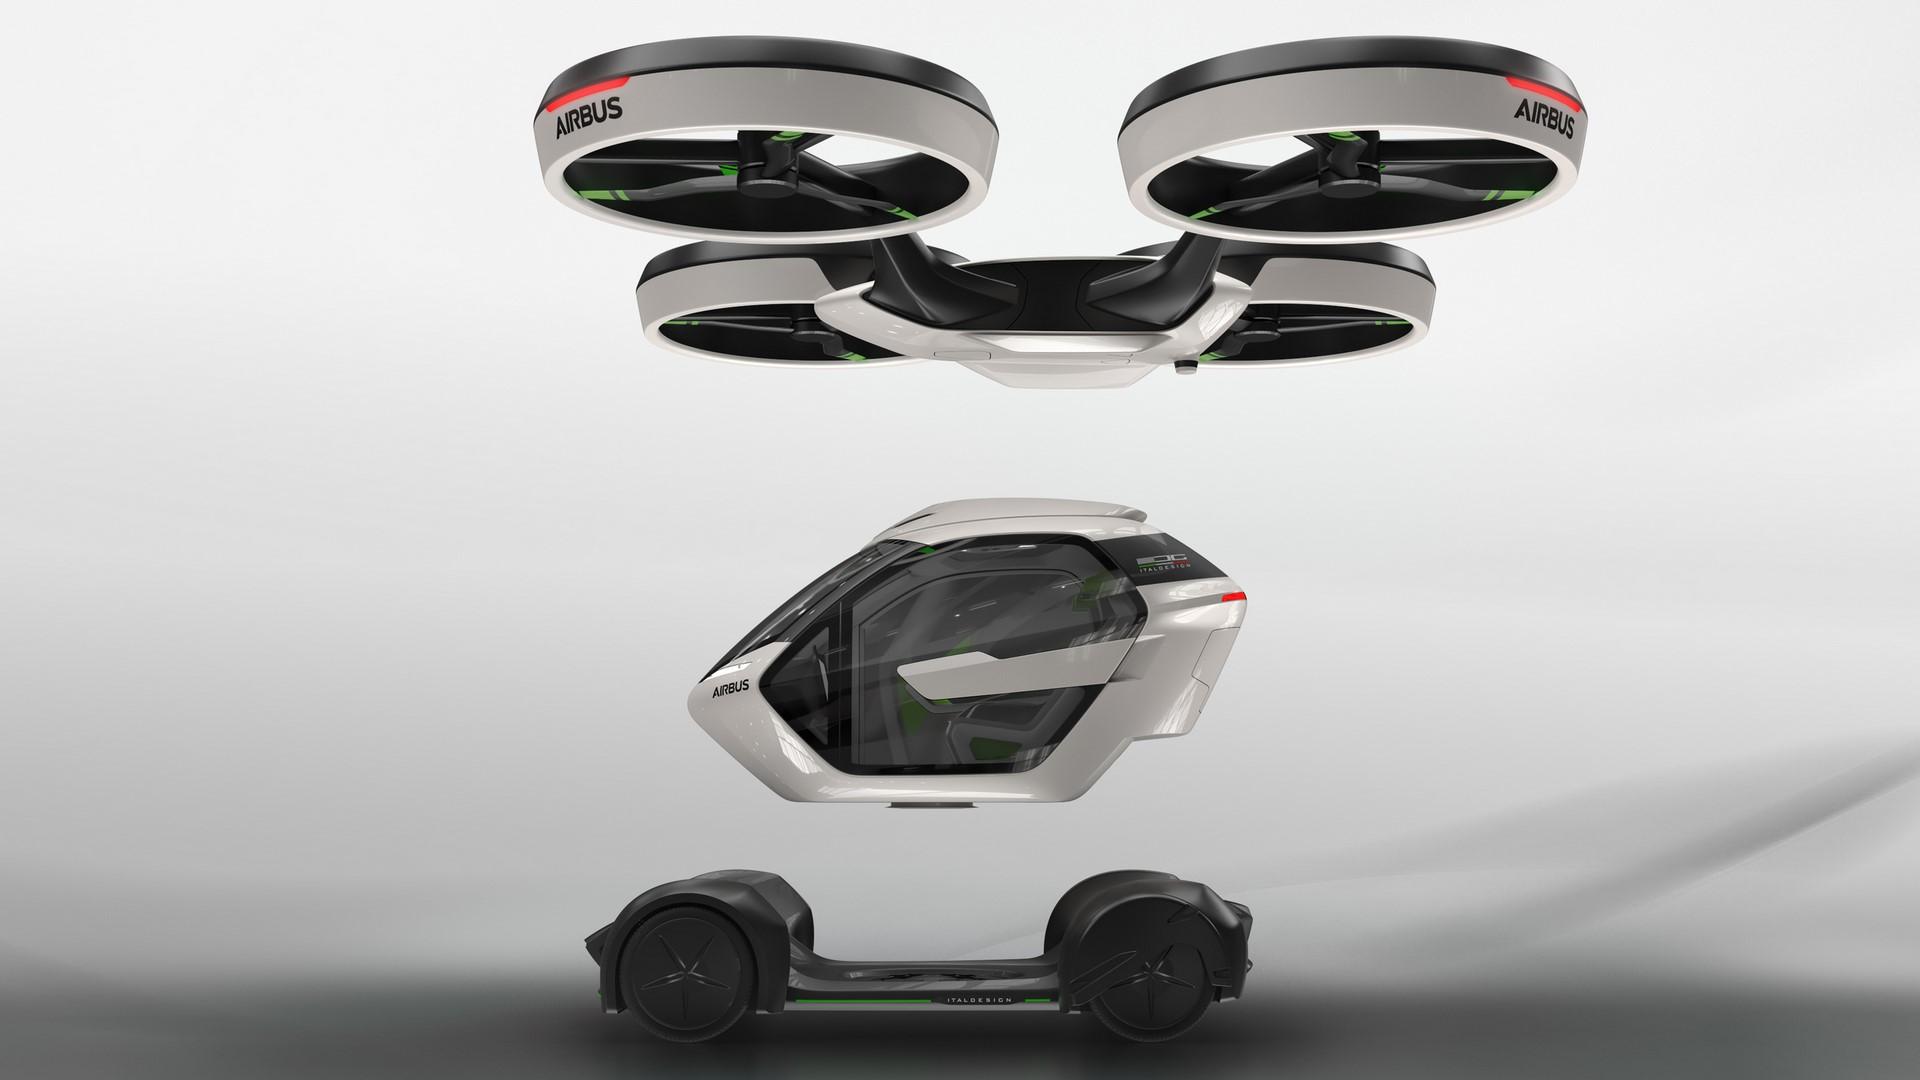 airbus-italdesign-popup-flying-car-10-1